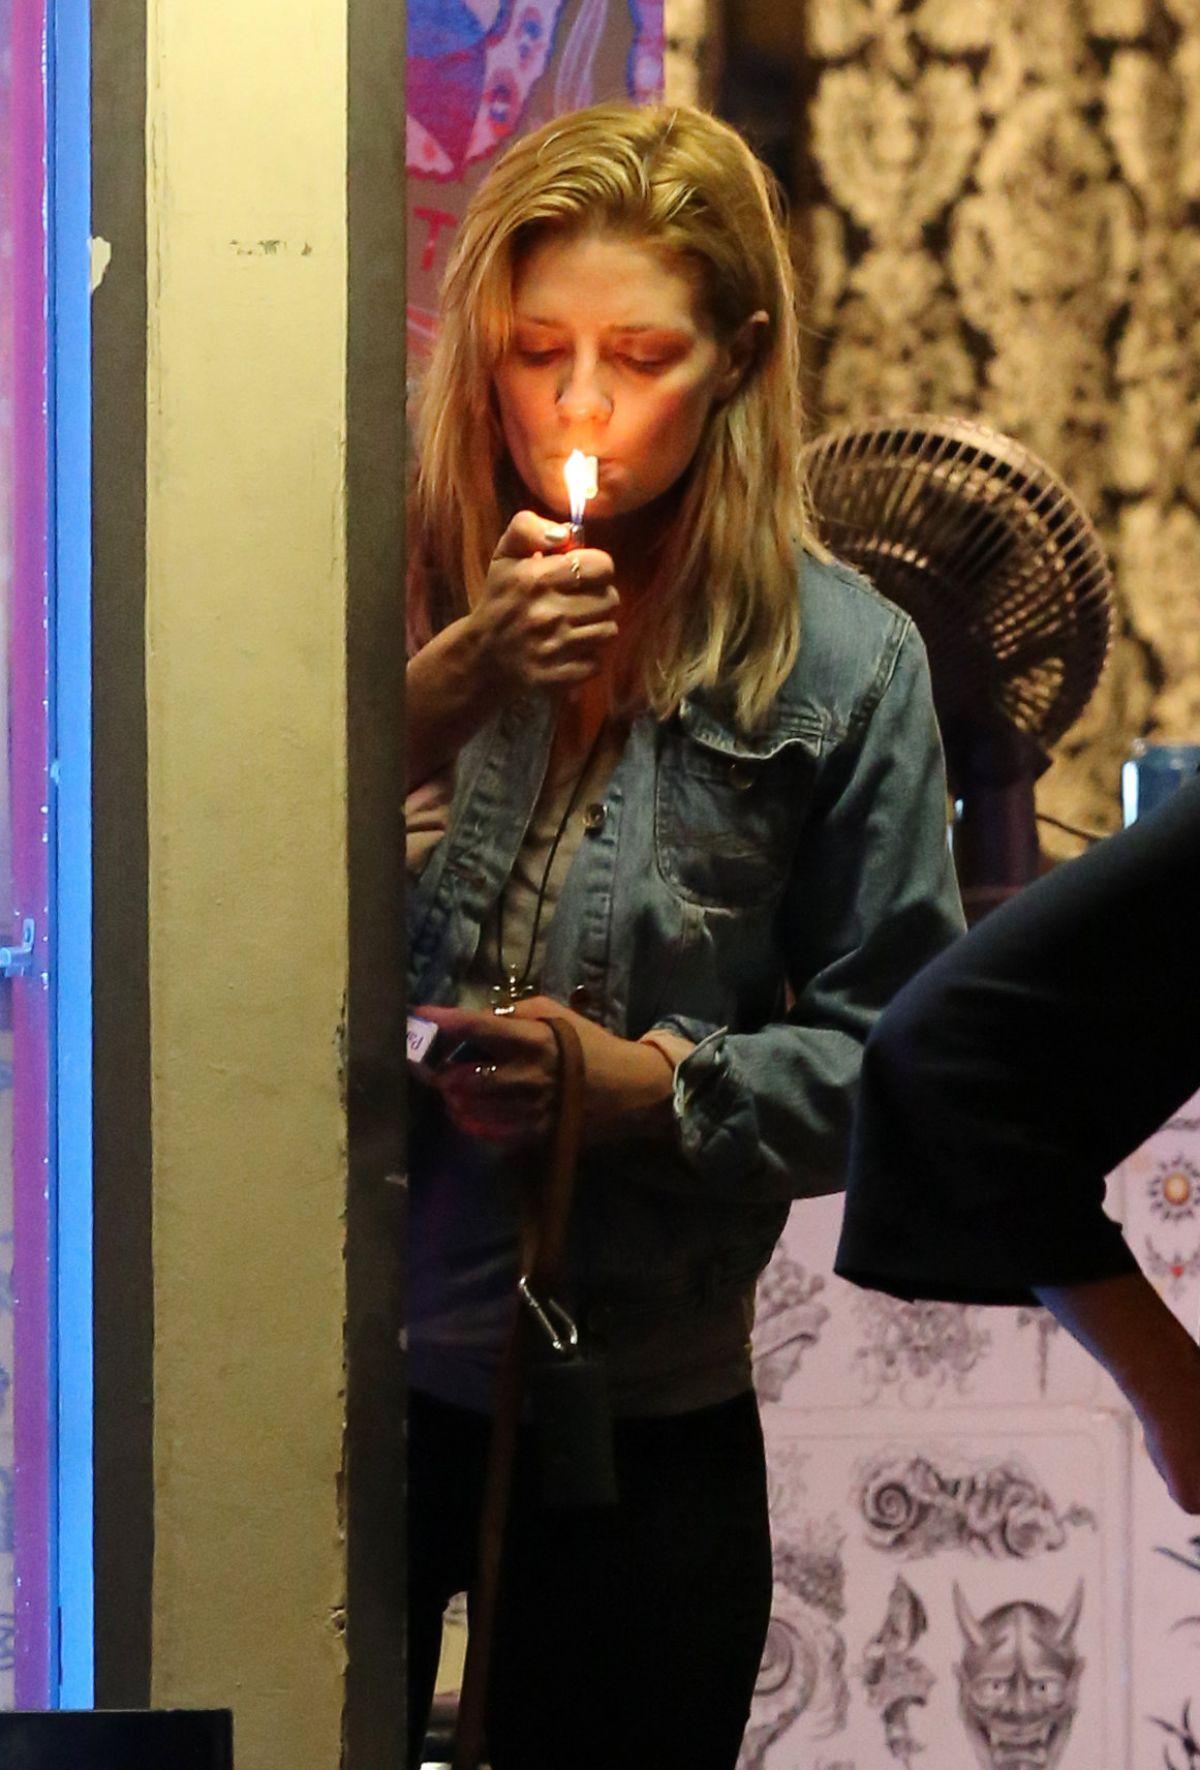 barton smoking Mischa